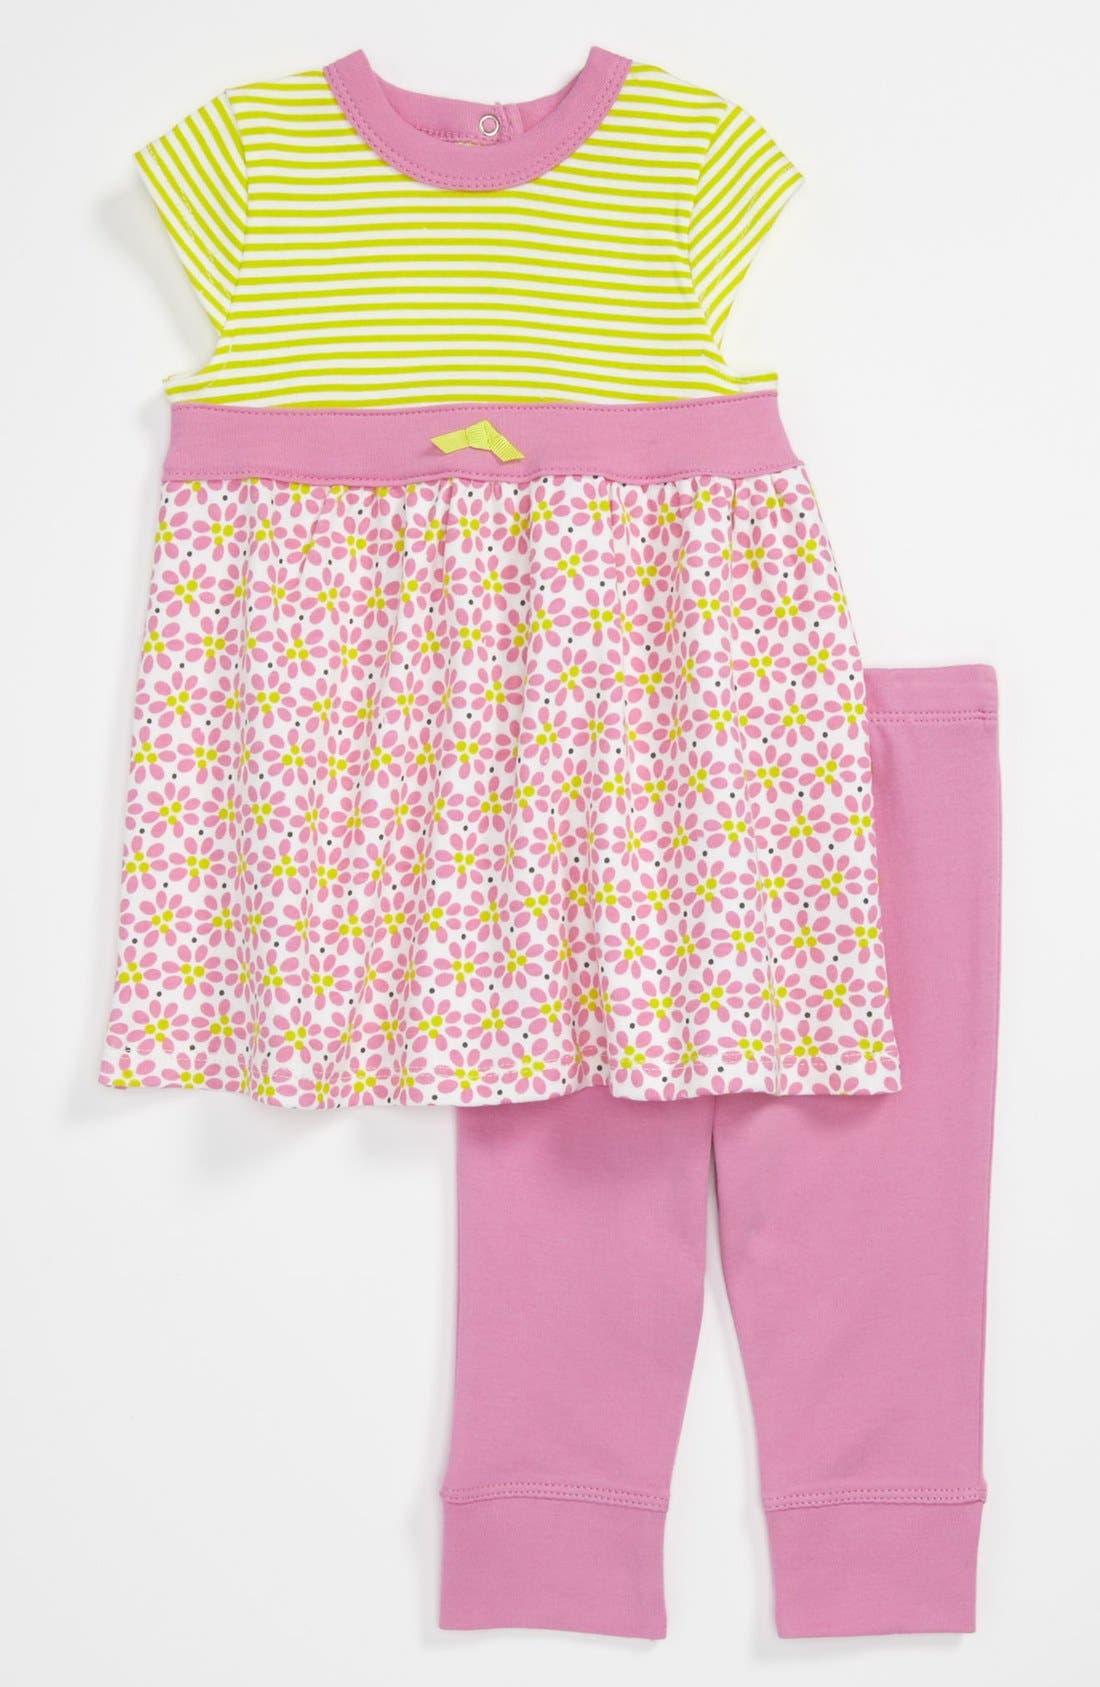 Main Image - Offspring 'Daisy' Dress & Leggings (Baby)